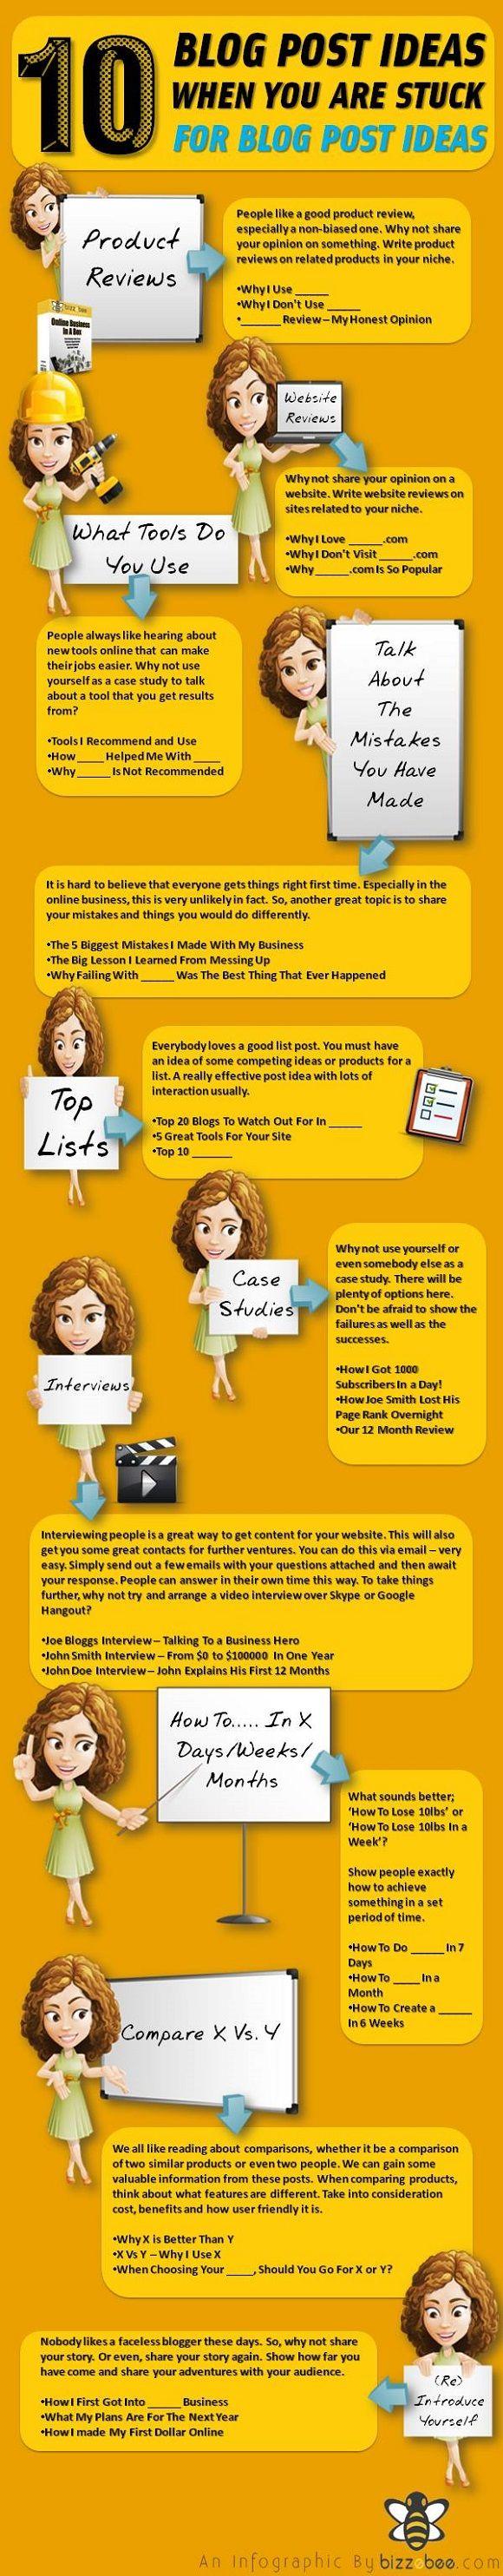 10 Blog post Ideas to help you gain more traffic #Marketing #LessStressMoreSuccess #infographic www.socialmediamamma.com